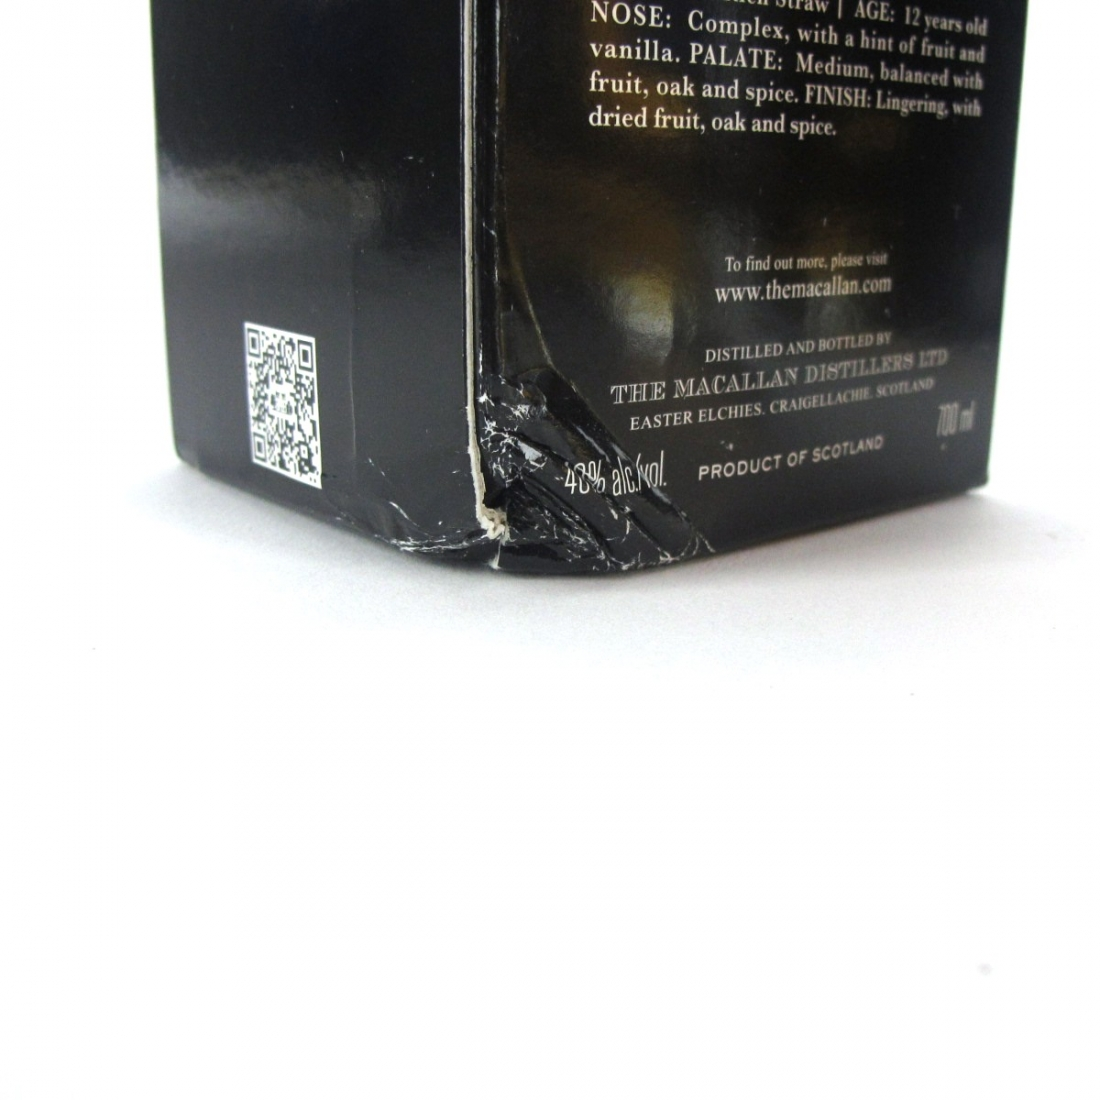 Macallan 12 Year Old Fine Oak - Nick Veasey Pillars Collection 6 x 70cl